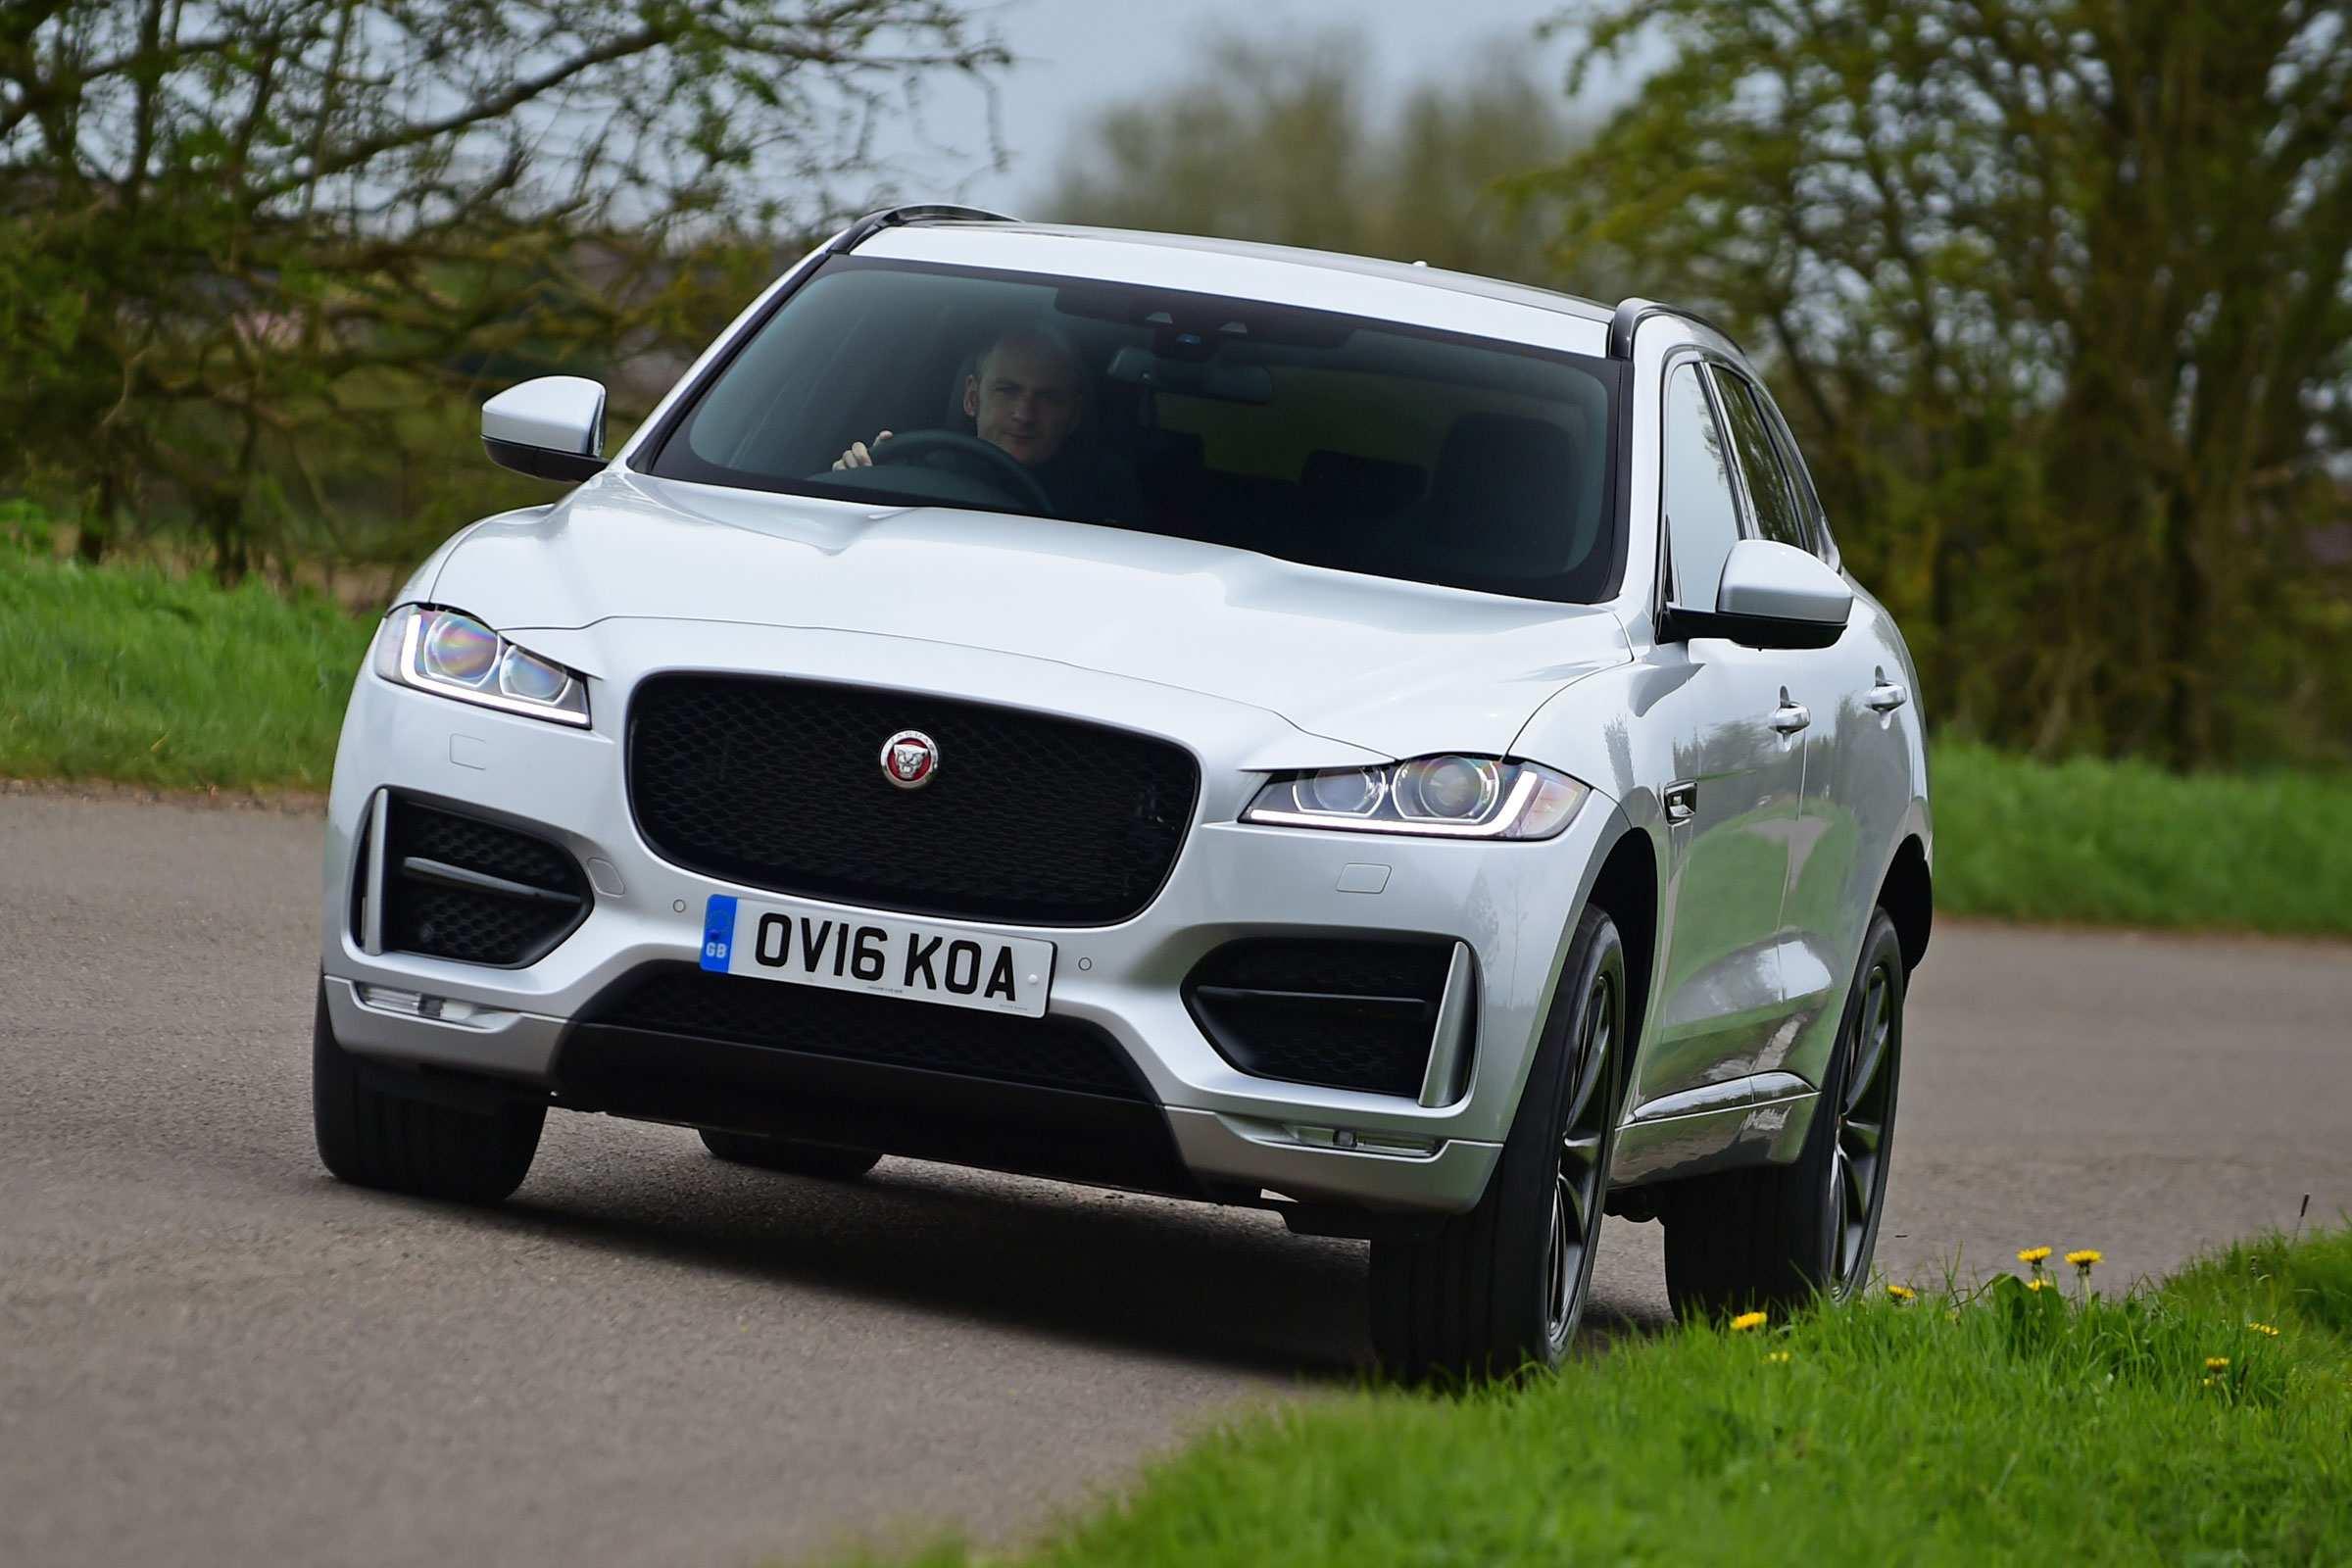 13 Concept of 2020 Jaguar Station Wagon Speed Test with 2020 Jaguar Station Wagon